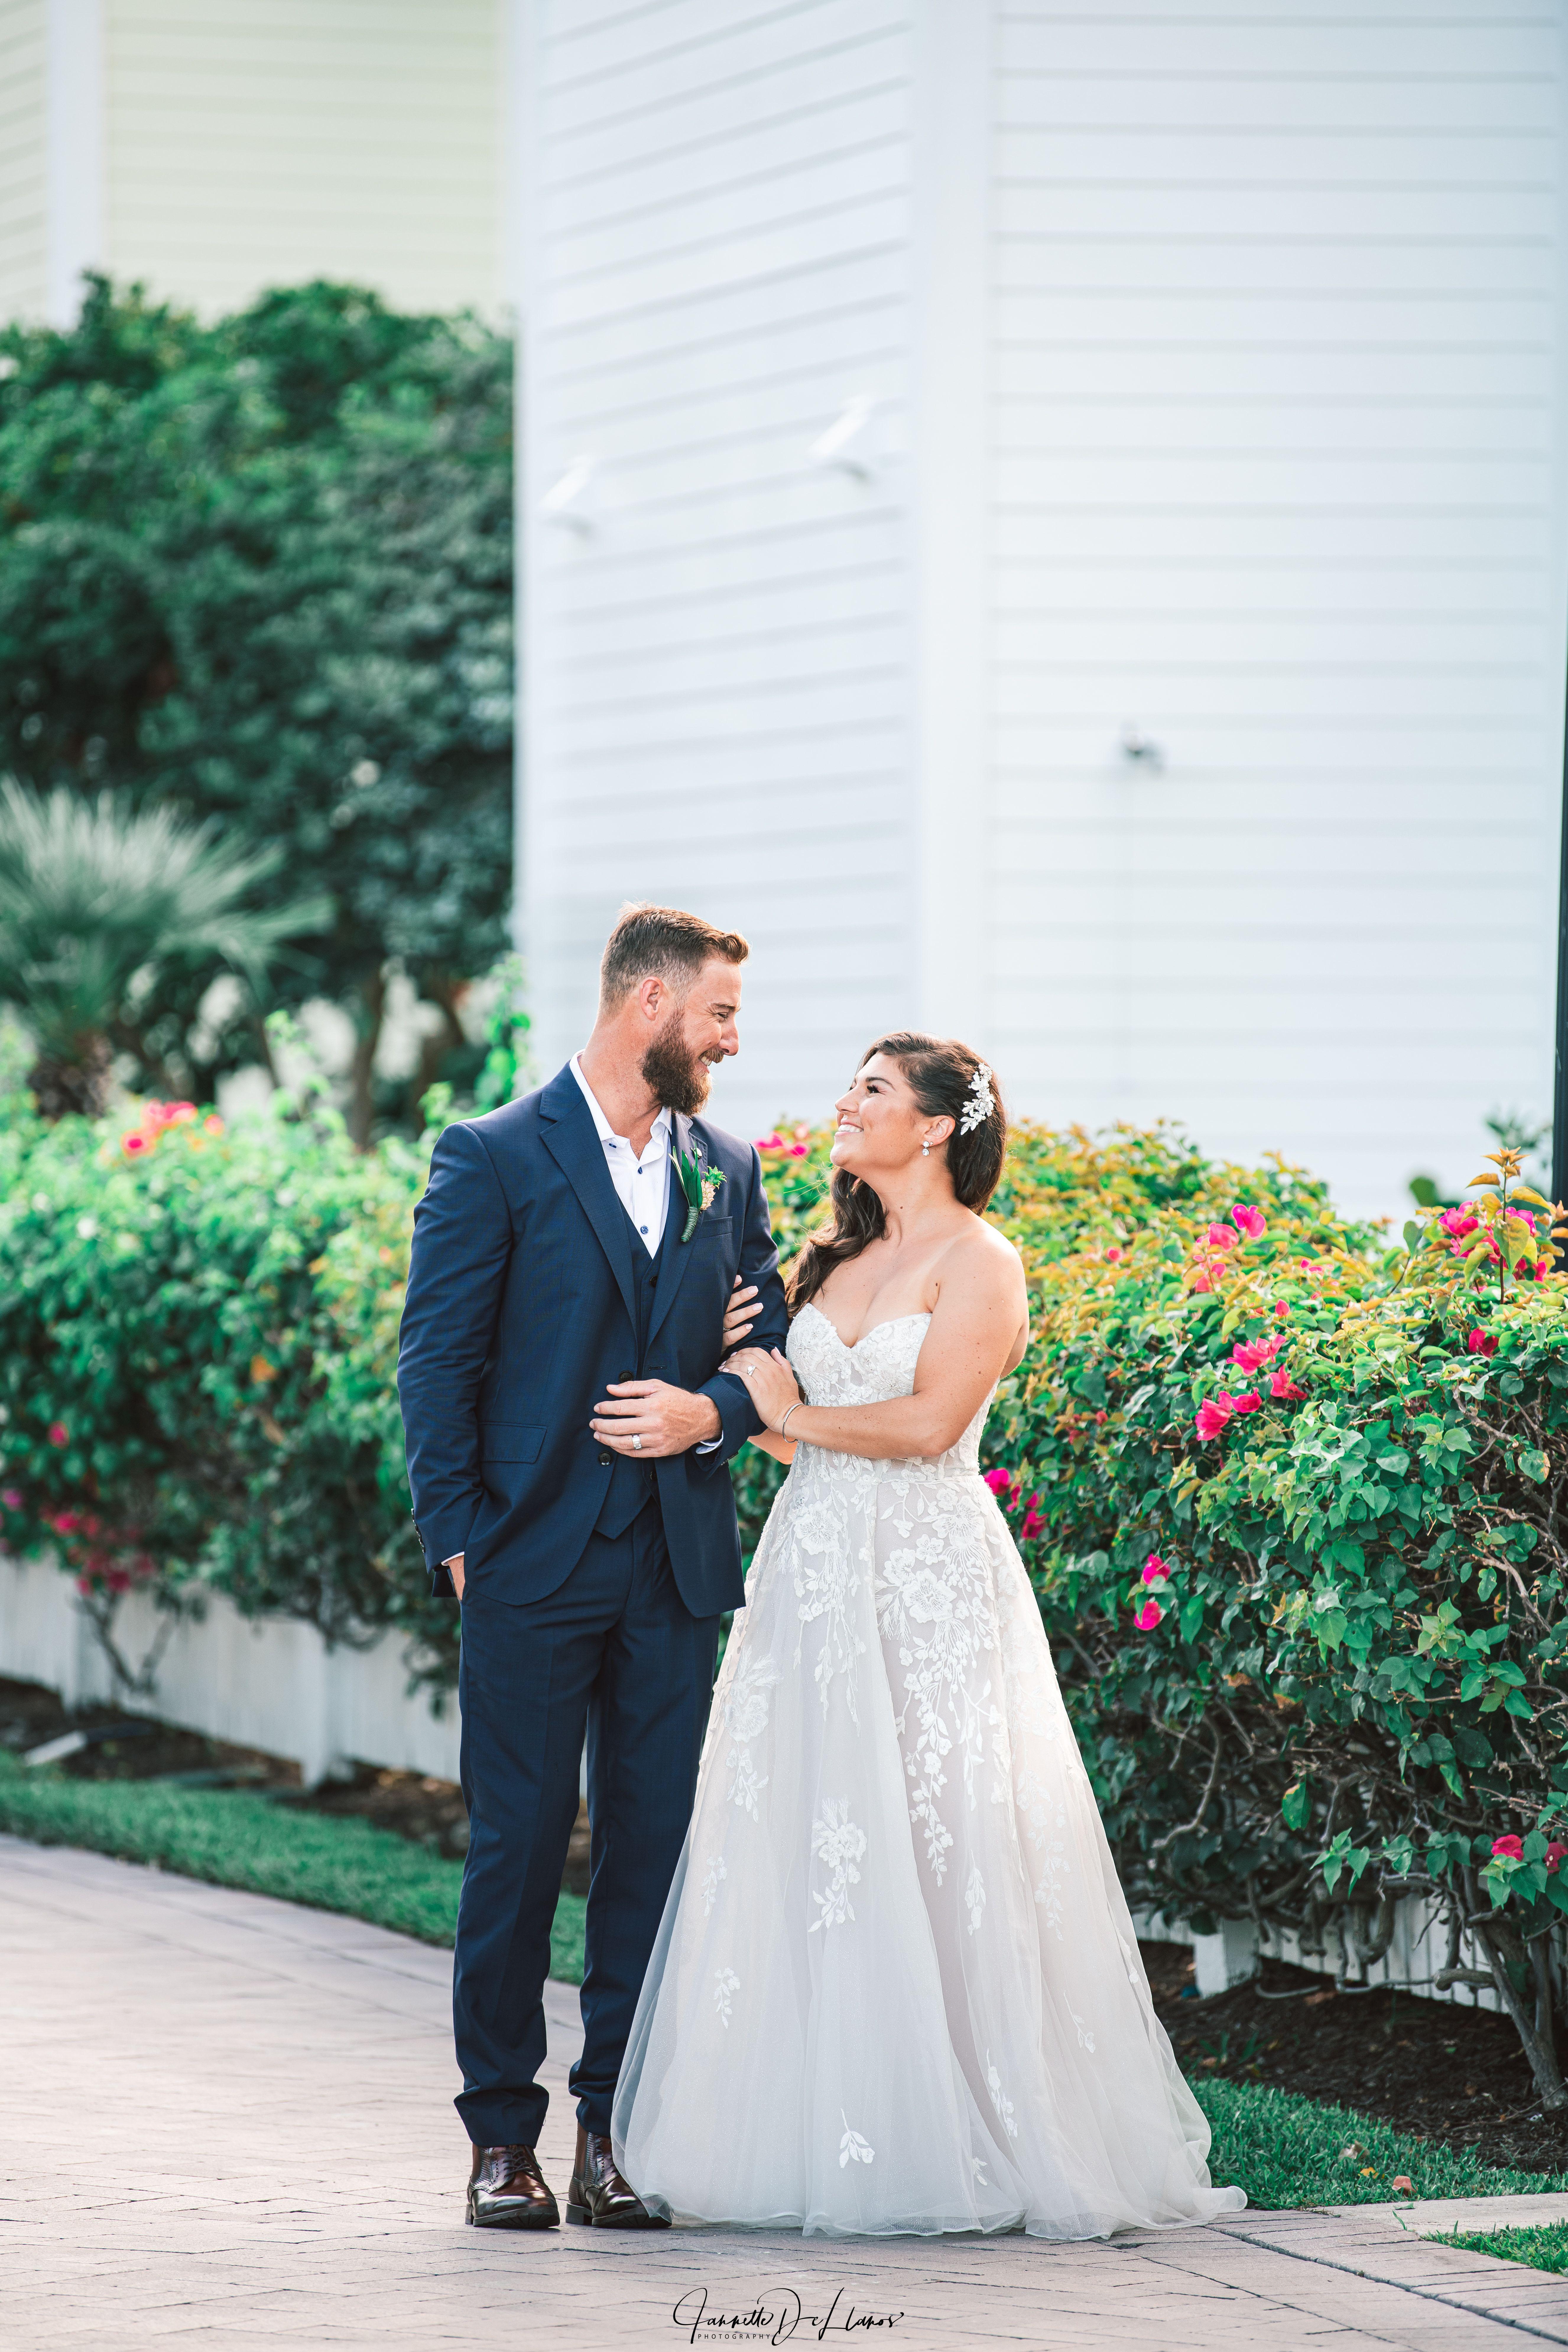 Wedding Photographer In The Florida Keys Key Largo Islamorada Key West In 2020 Beach Wedding Photography Wedding Photographers Florida Keys Wedding Venues